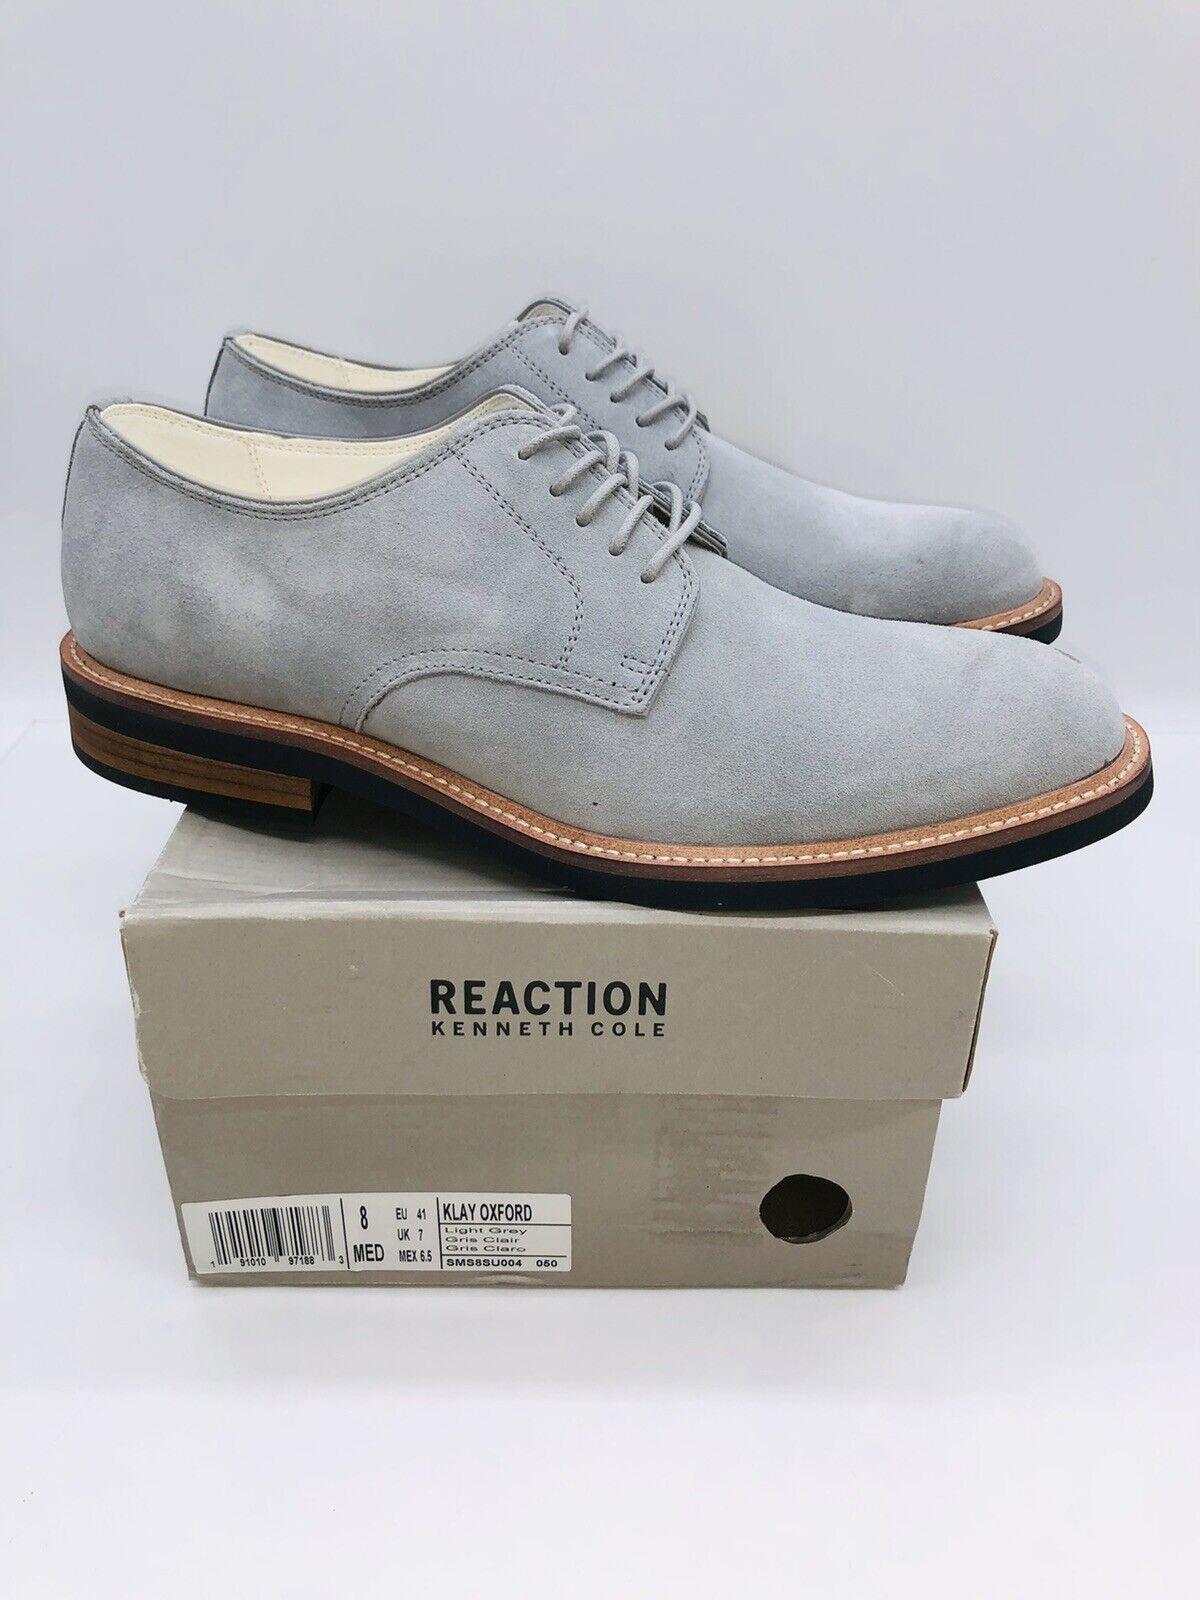 Kenneth Cole Reaction Men's Klay Lace Up Oxfords / Dress Shoes Light Grey US 8M